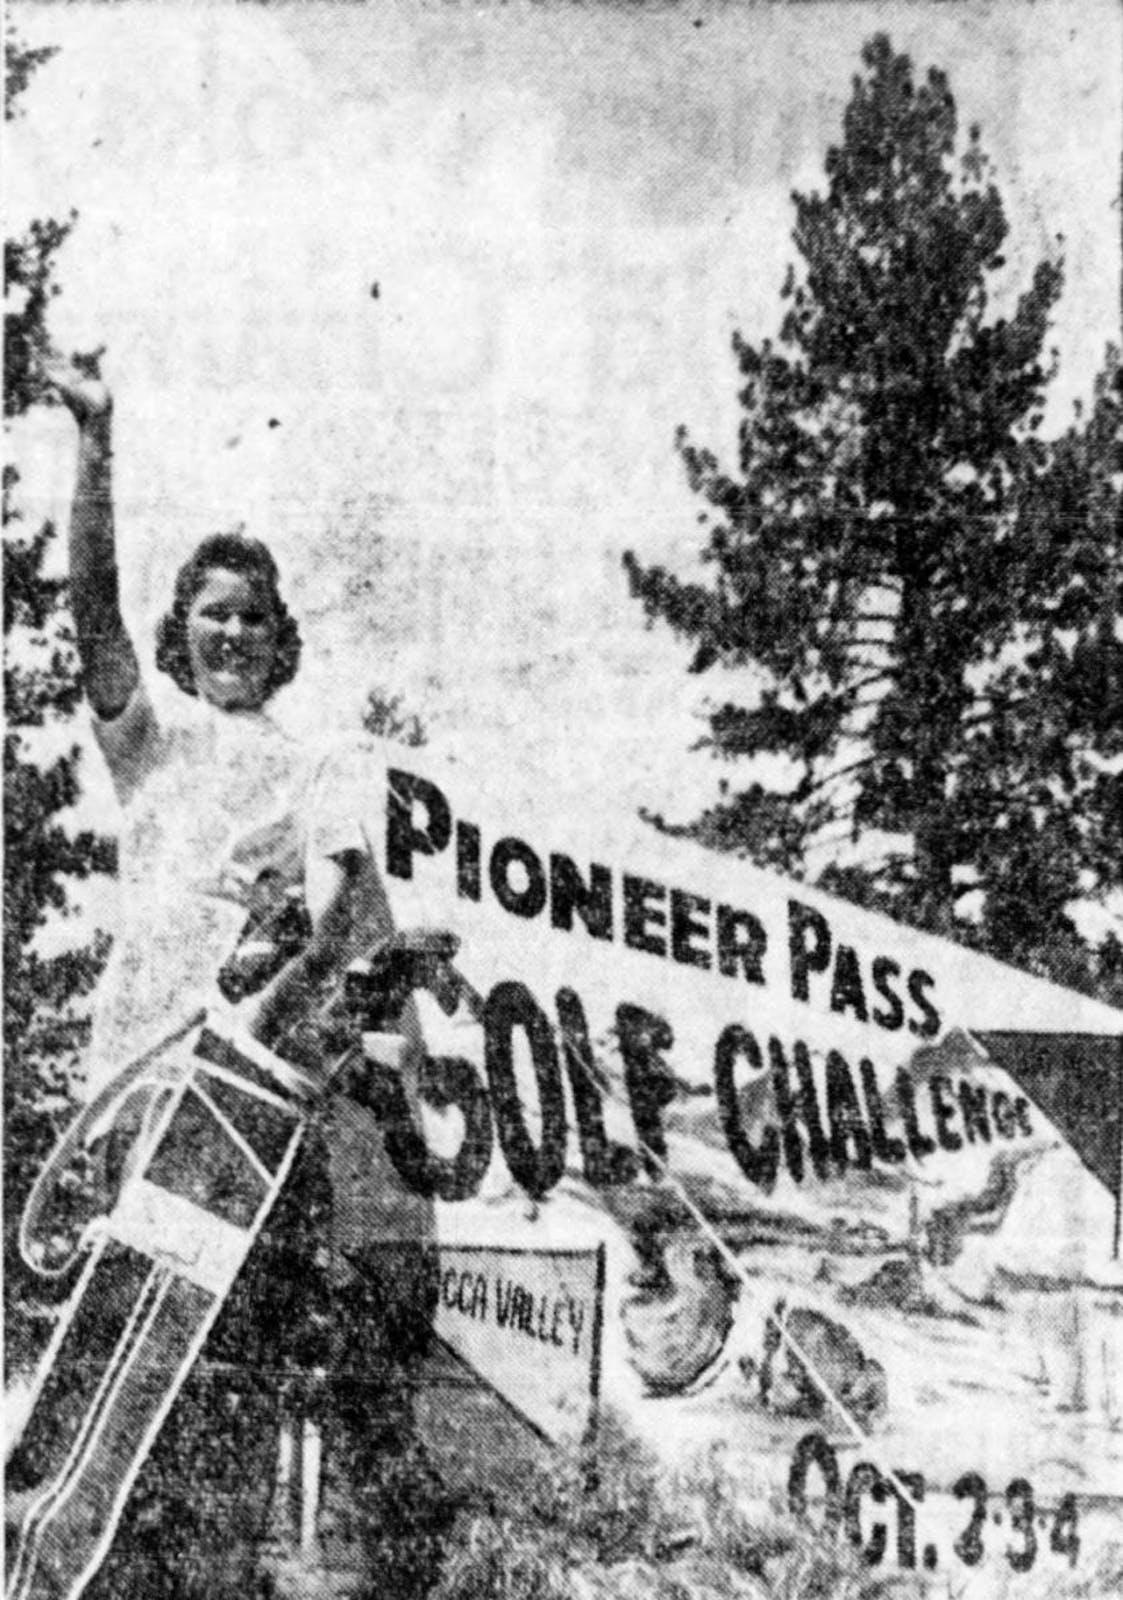 Pioneer Pass Golf Challenge, Pioneertown image